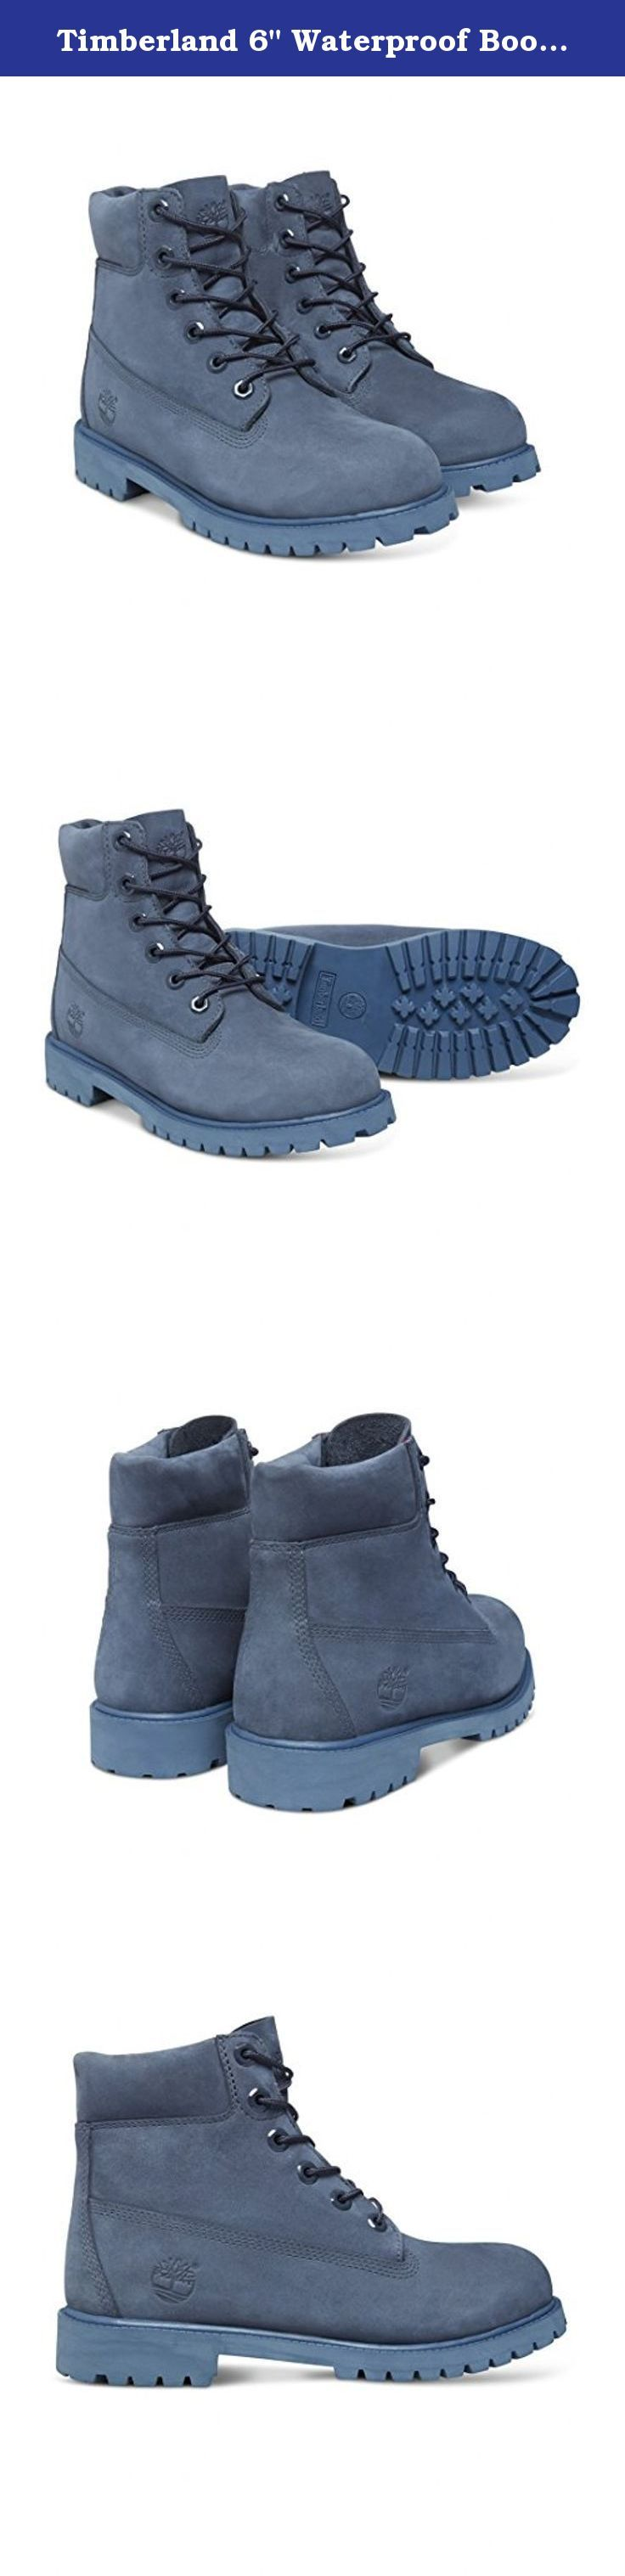 "Timberland 6"" Waterproof Boots Unisex Juniors (7 Big Kid M, Navy Monochromatic (Nightshadow)). Kids Timberland 6 Inch Nightshadow Monochromatic."